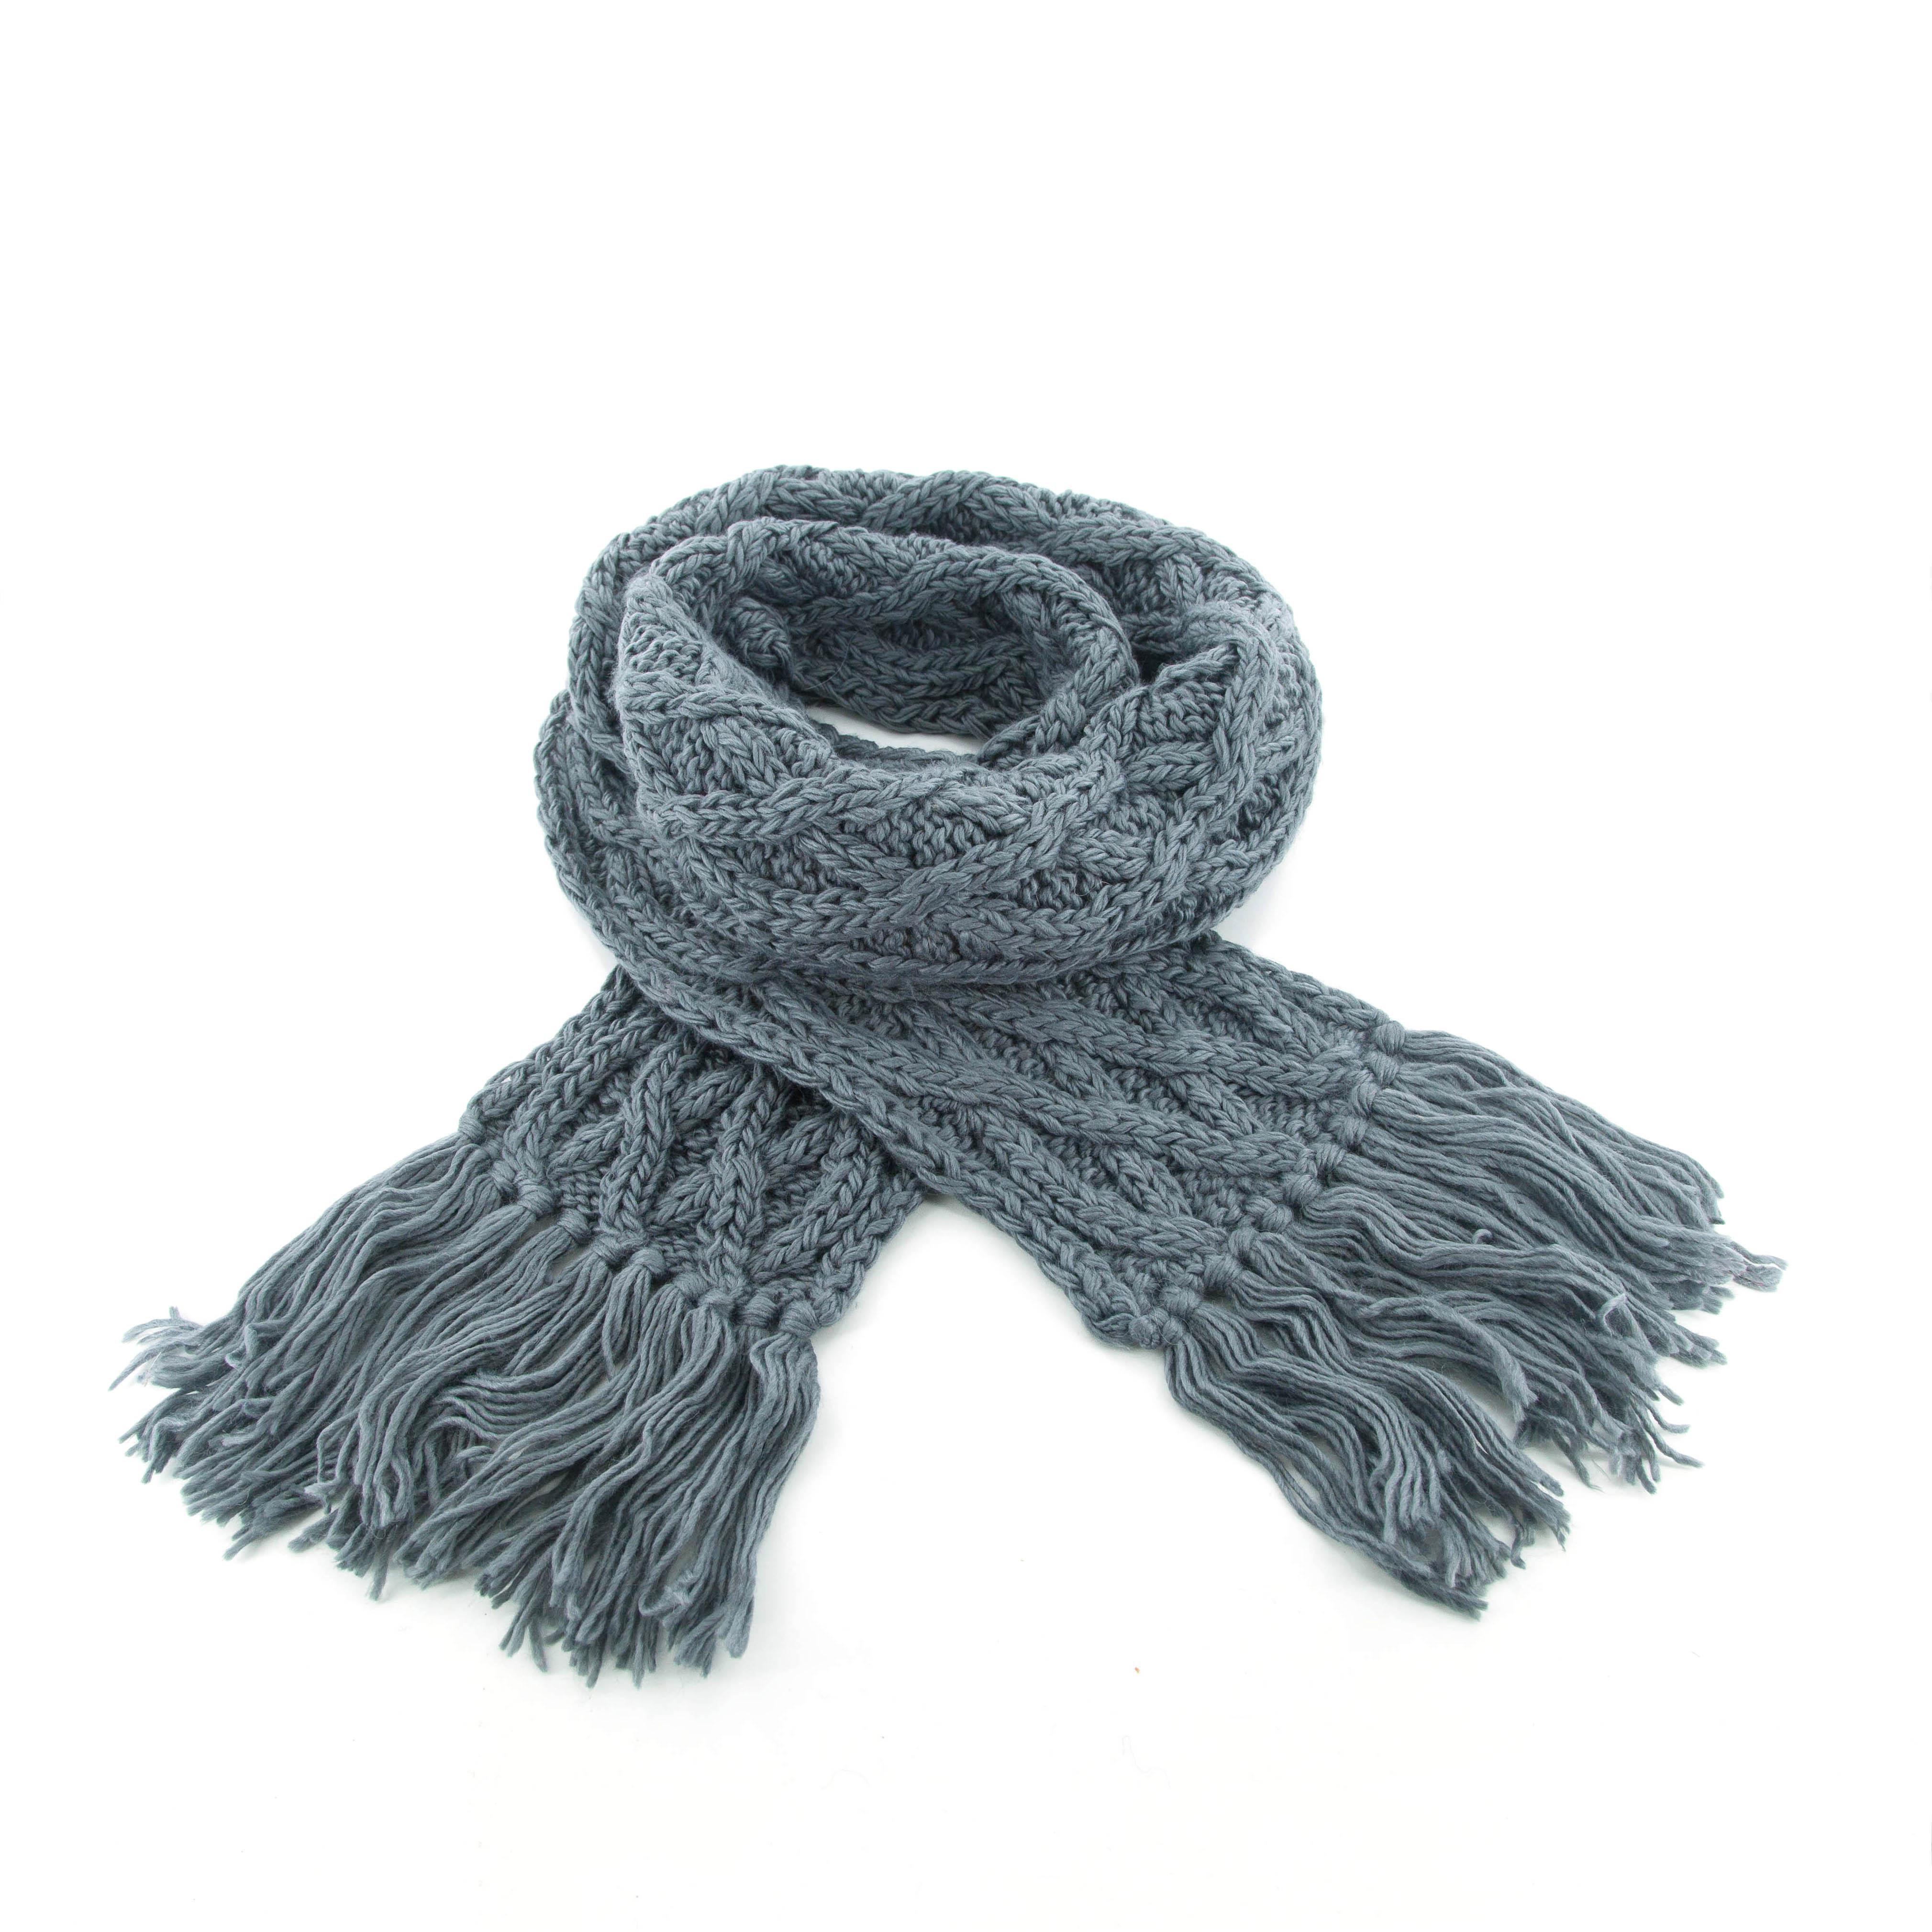 cf391bbf9bc China scarves gloves hat wholesale 🇨🇳 - Alibaba